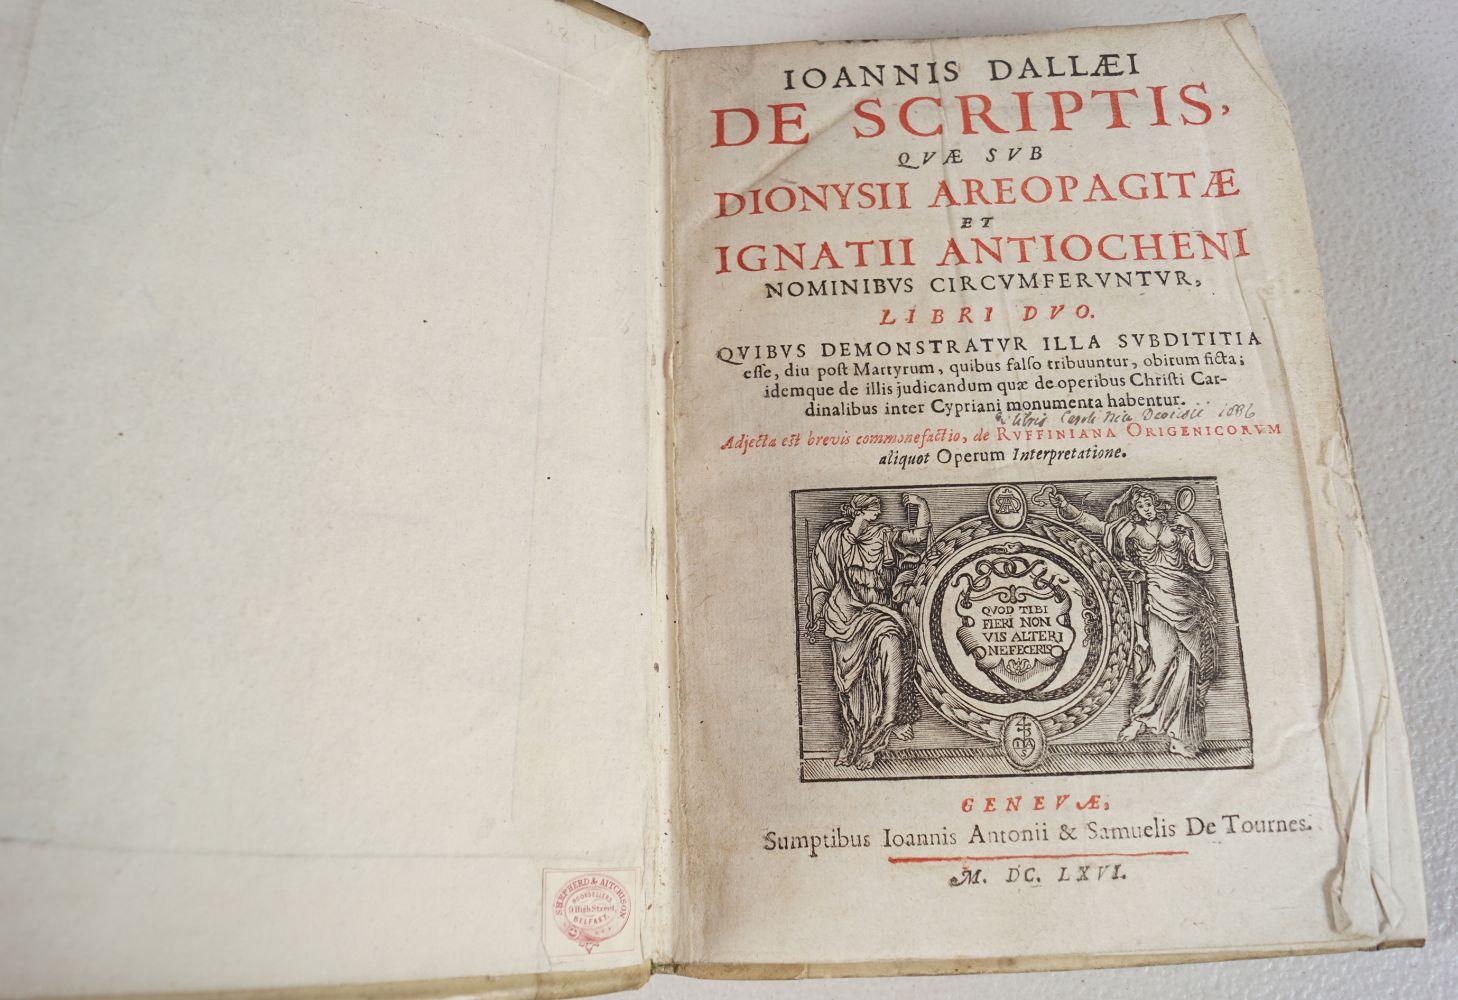 BOOK: JOANNIS DALLAEI